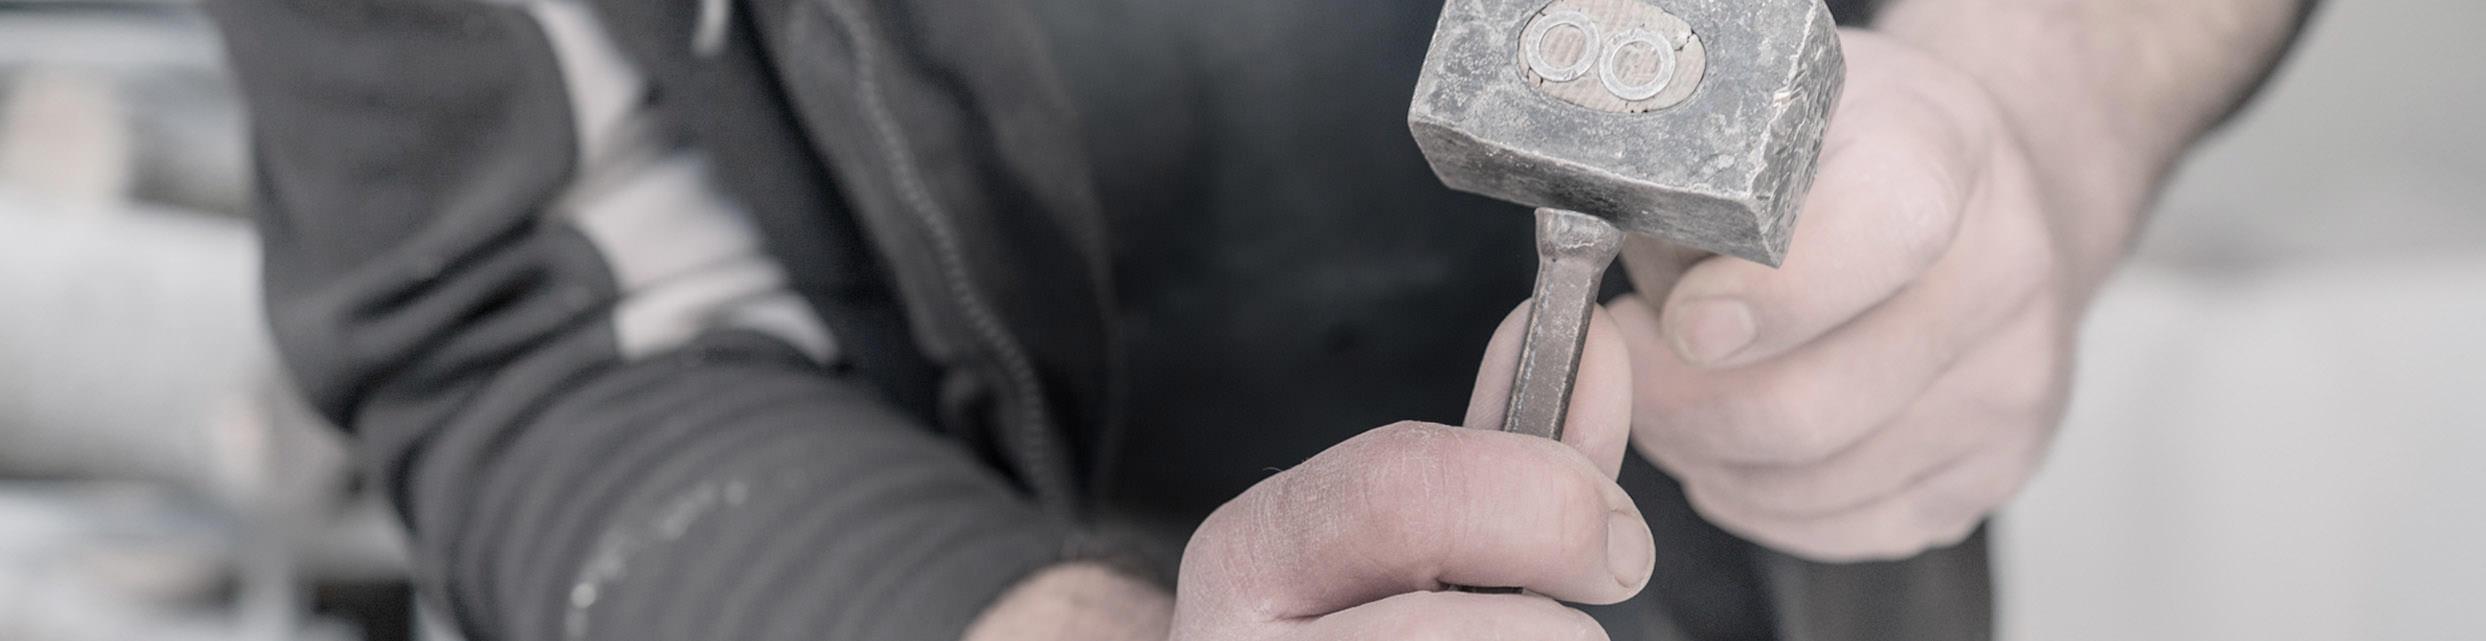 Franke Naturstein - erstklassige Handwerkskunst